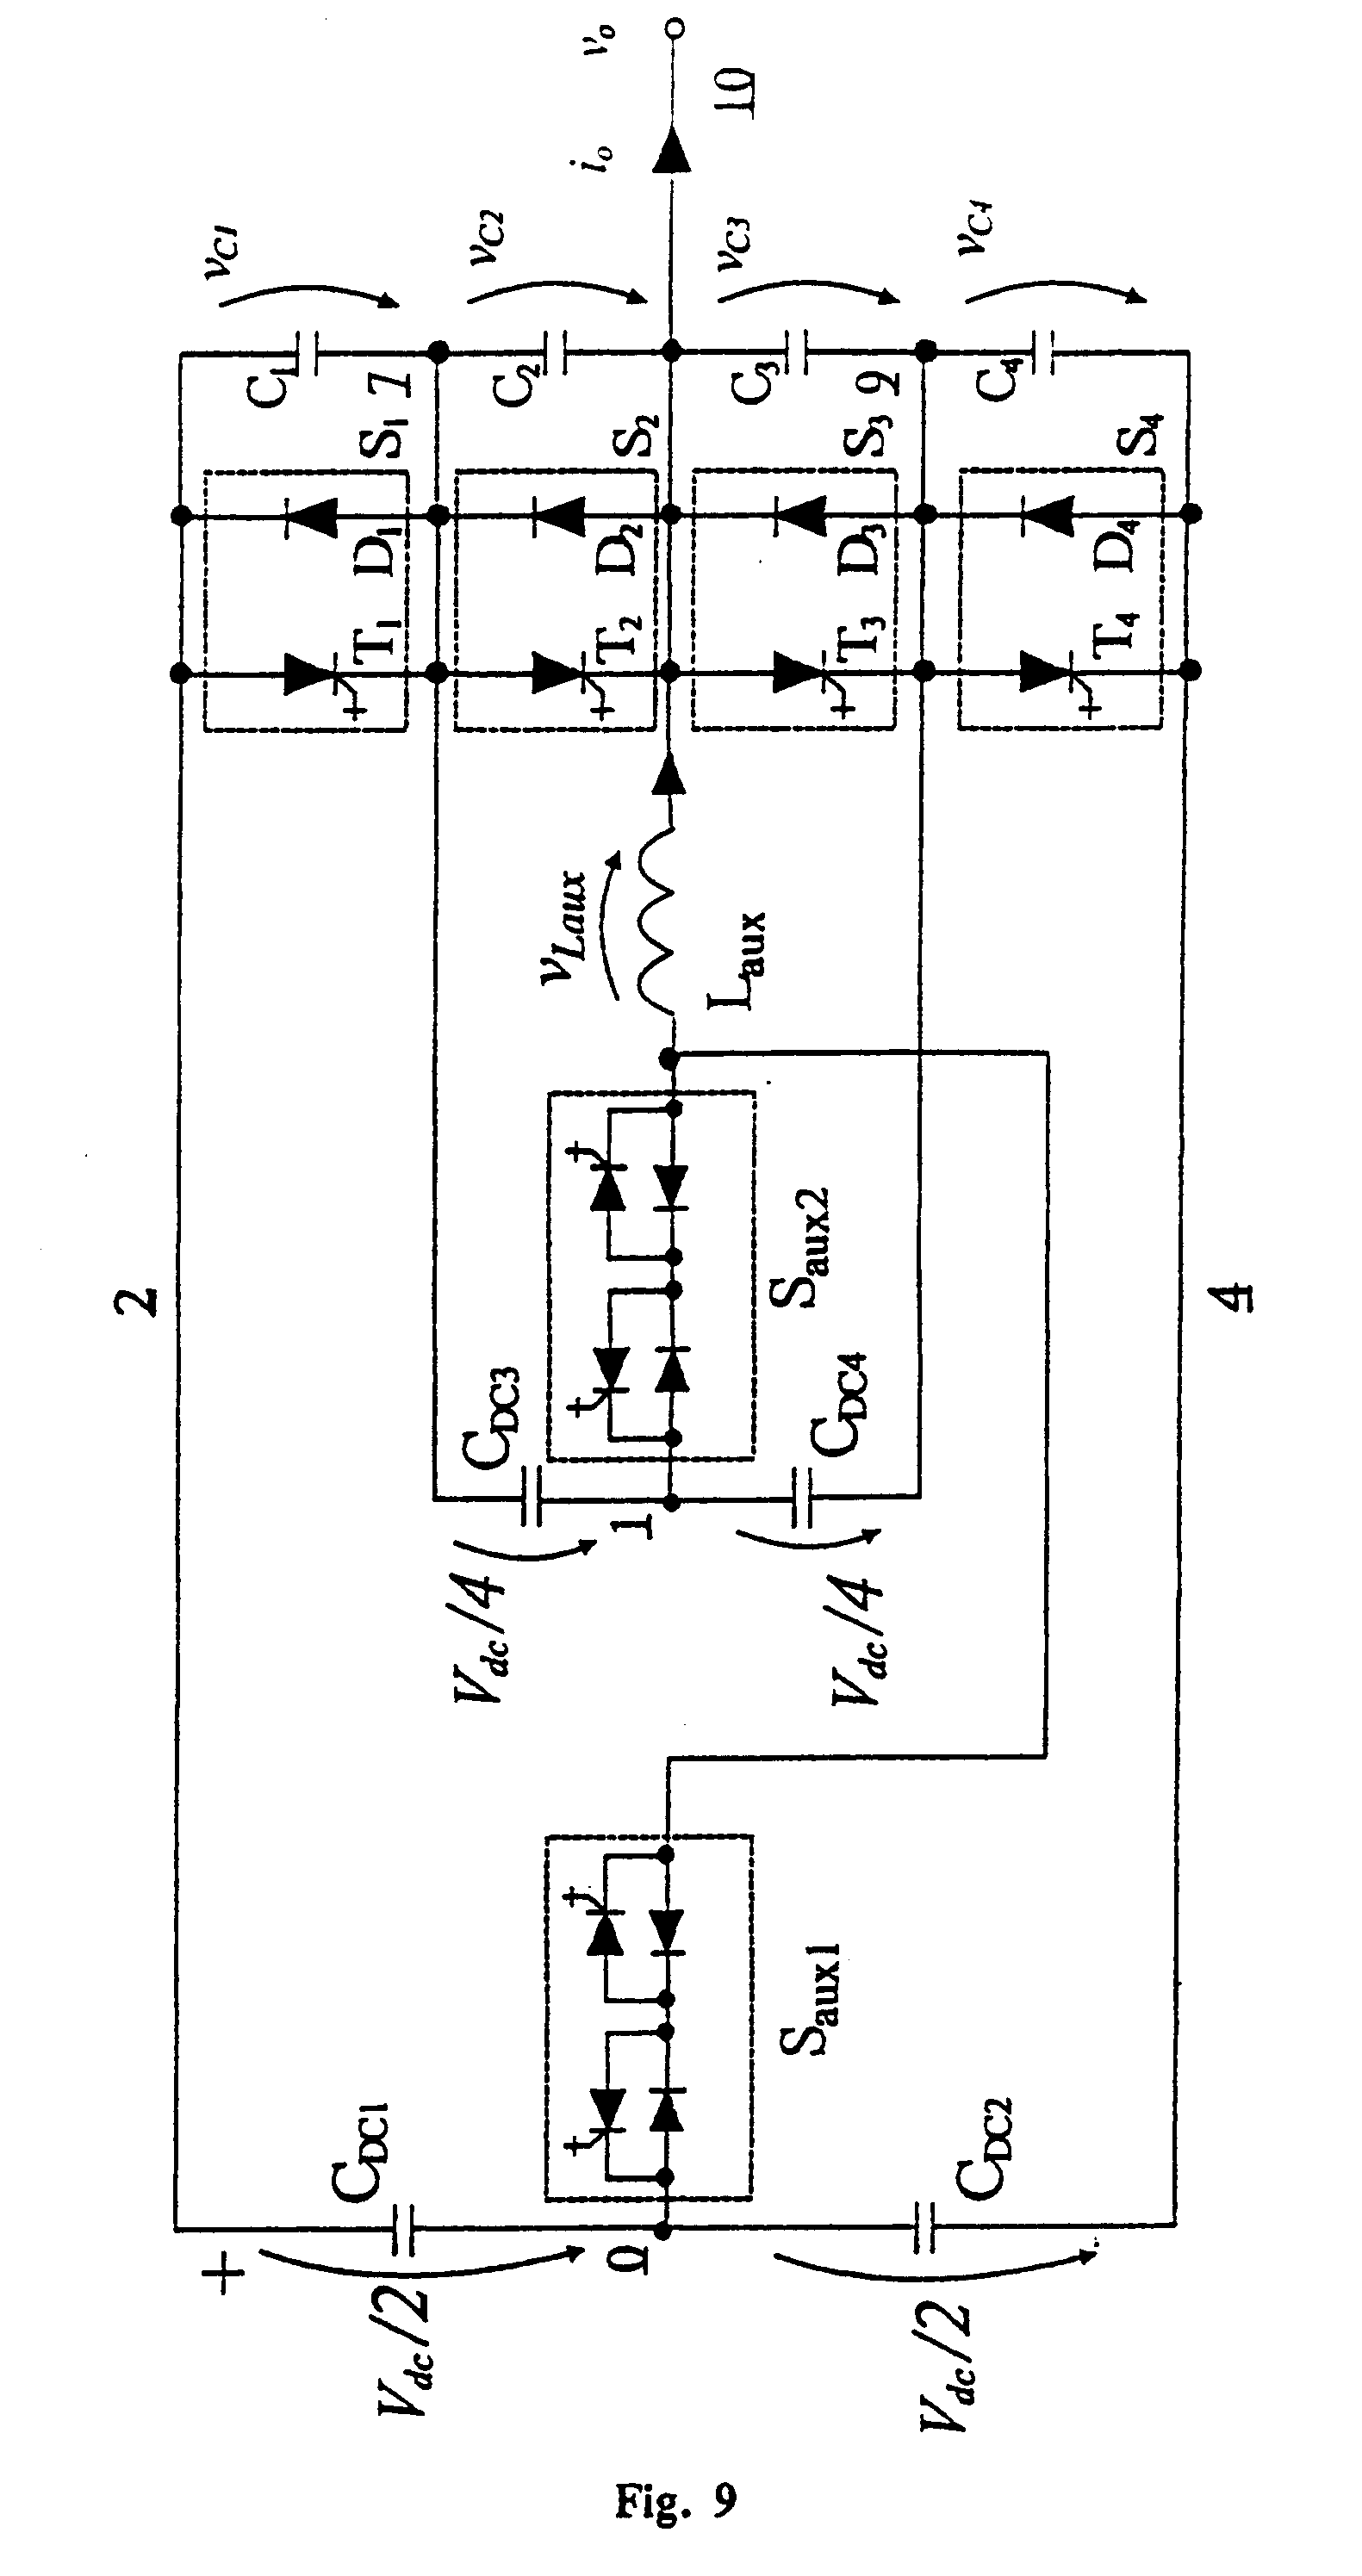 patente us6278626